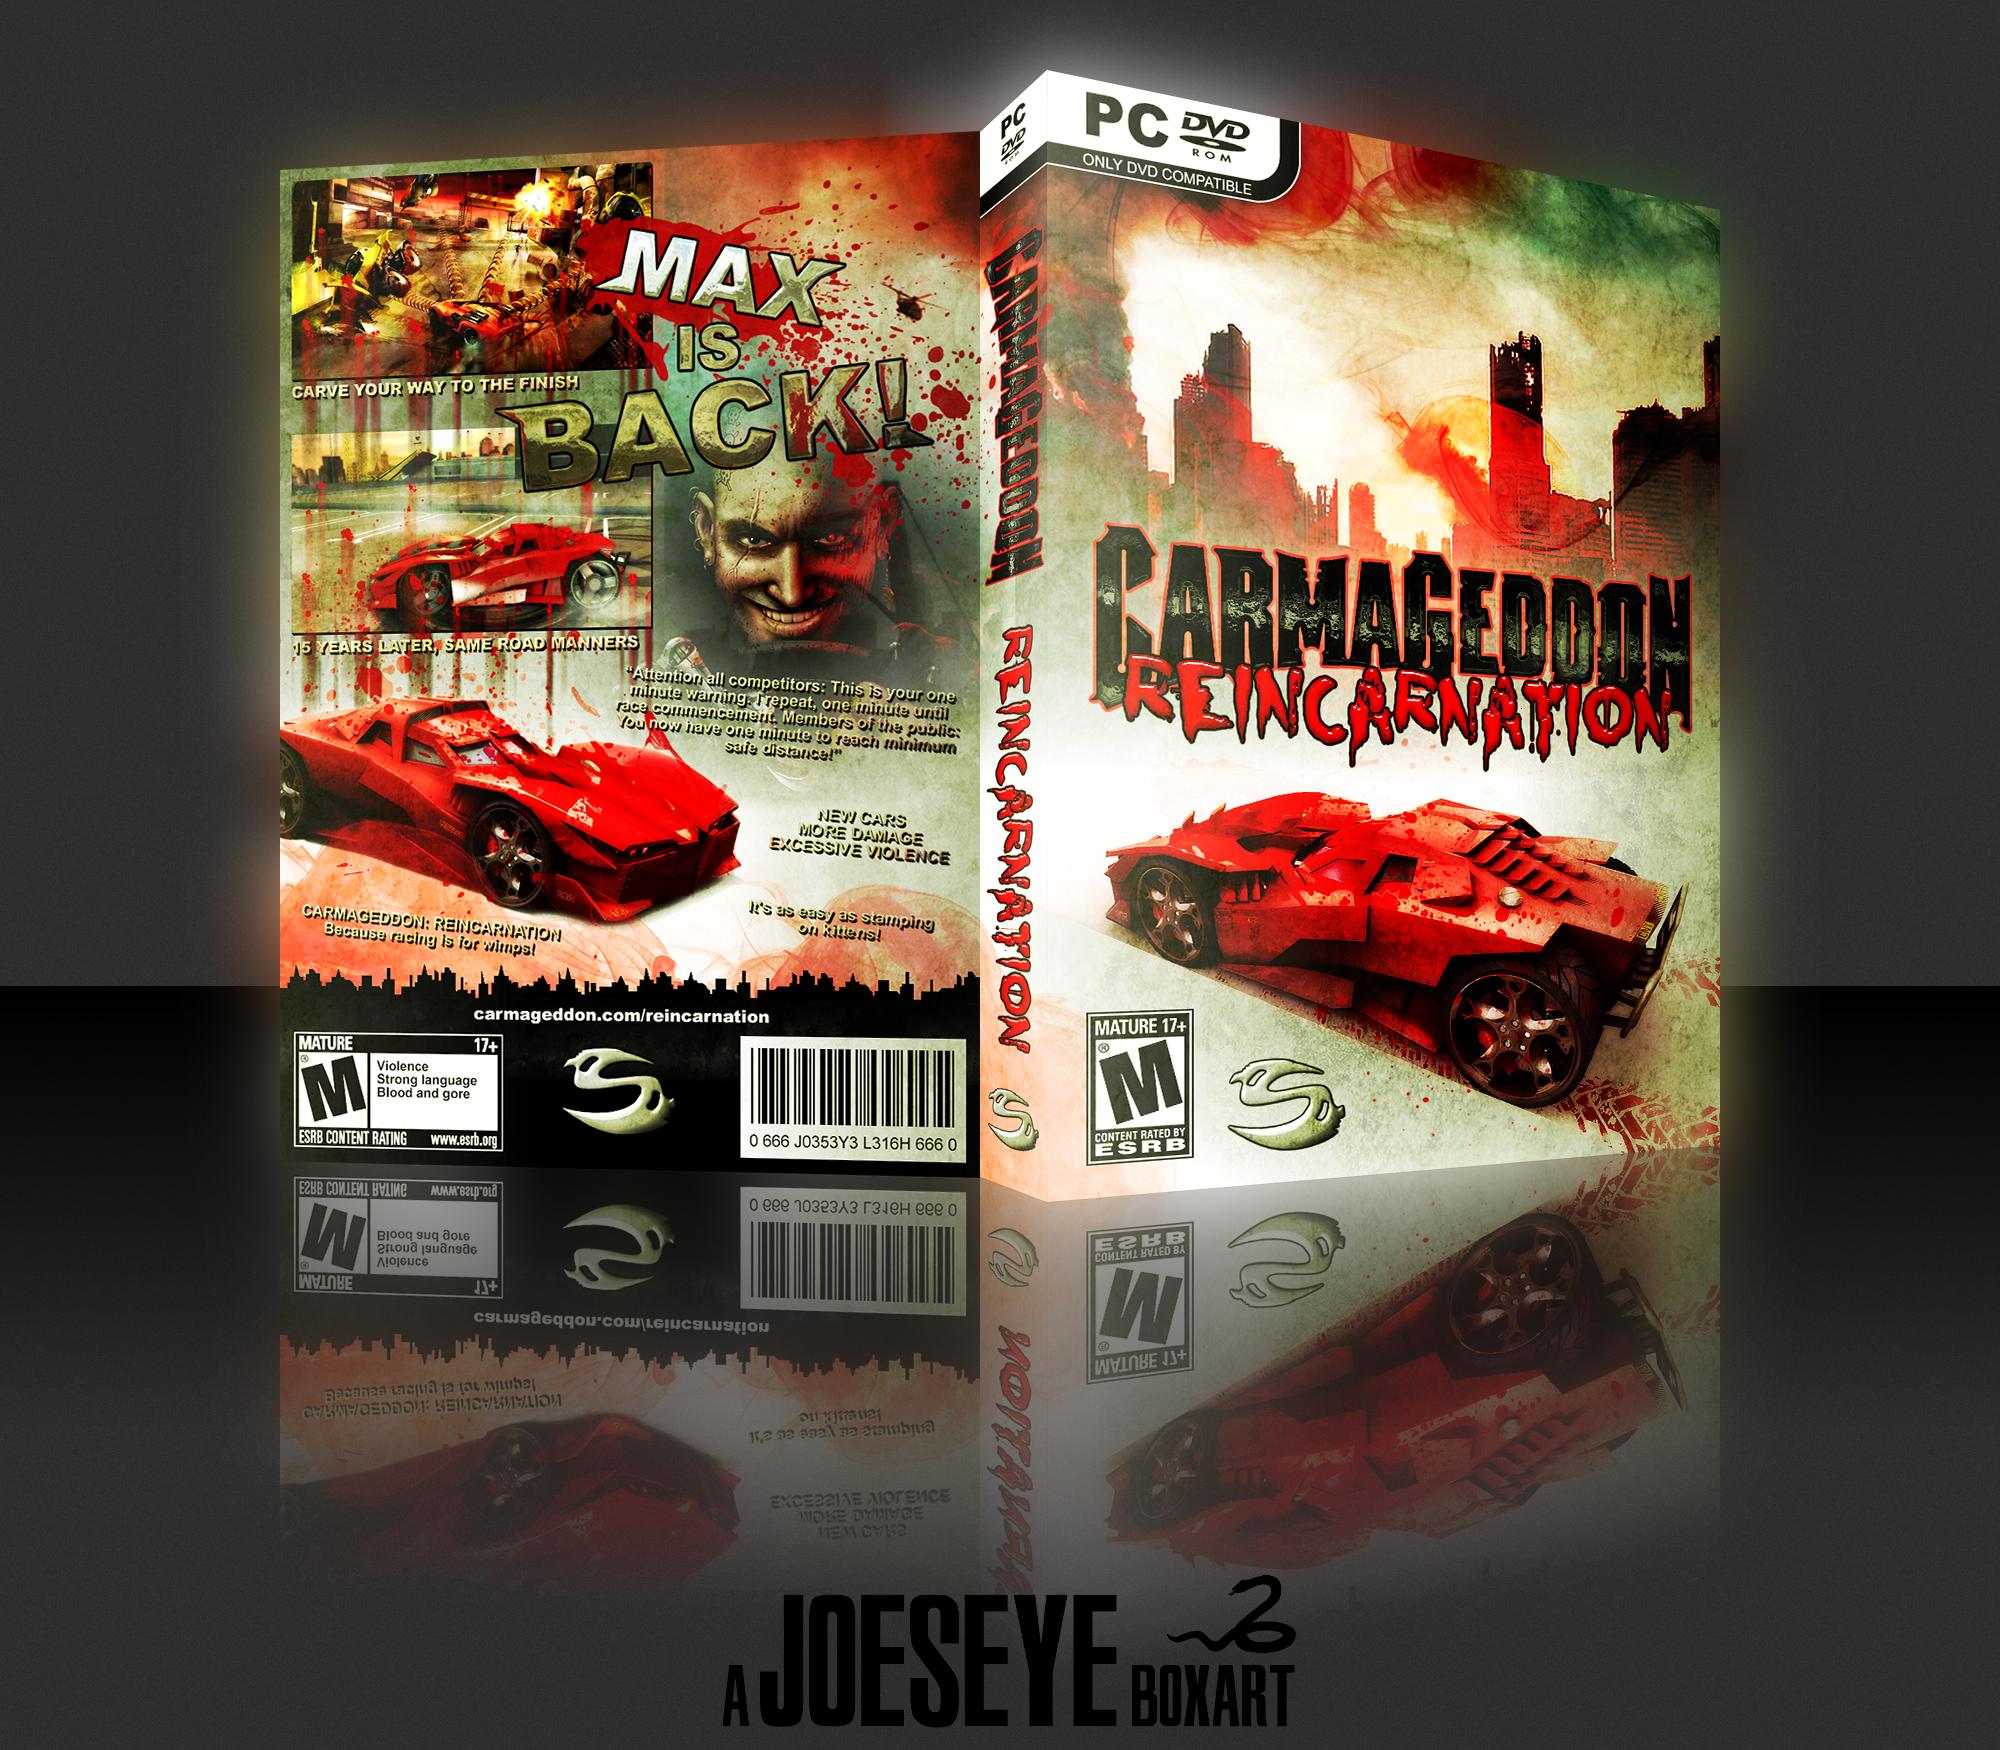 Carmageddon >> Carmageddon: Reincarnation PC Box Art Cover by Joeseye